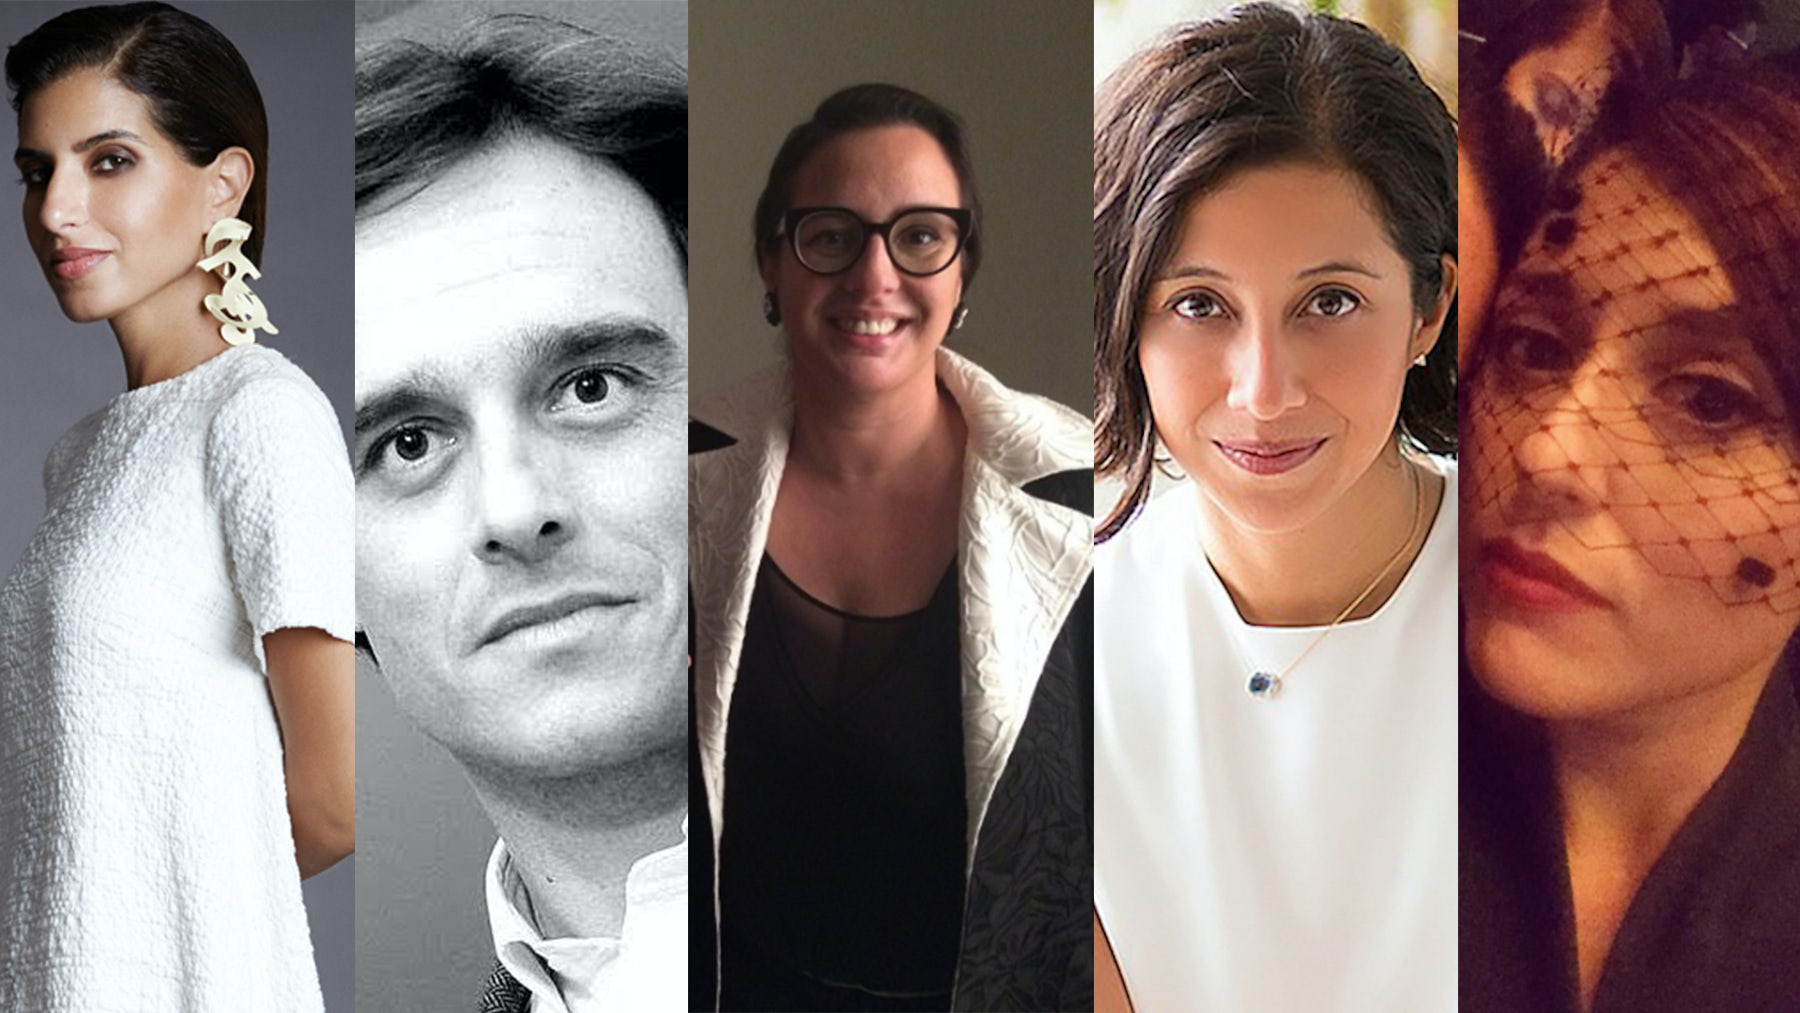 From left: Deena Aljuhani Abdulaziz, Emanuele Farneti, Silvia Rogar, Karla Martinez and Eugenia de la Torriente | Sources: Courtesty, Instagram